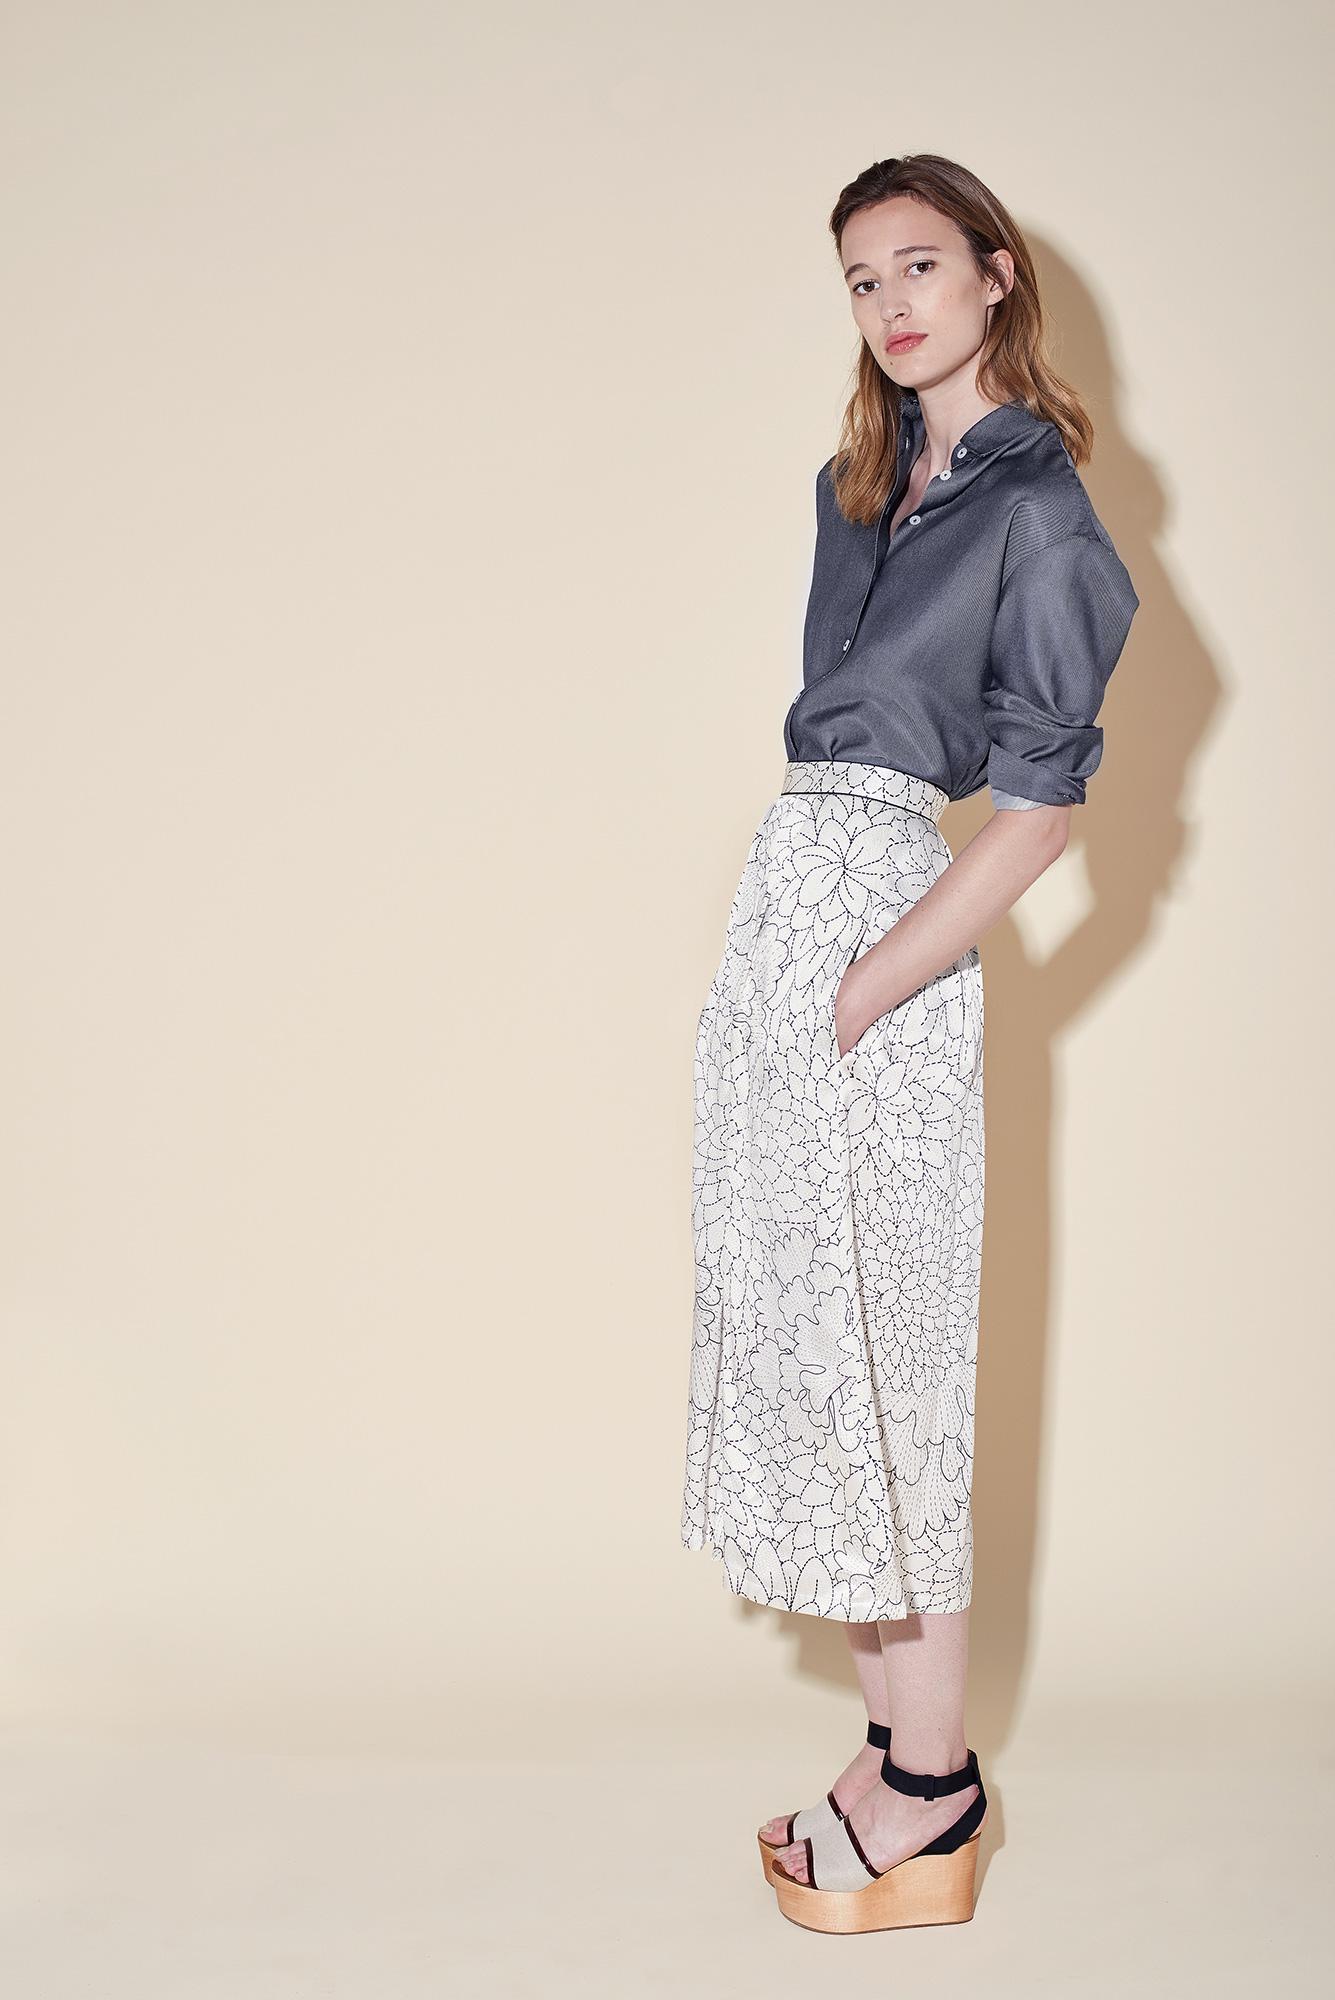 Man shirt silk denim - Culottes silk seersucker blossom